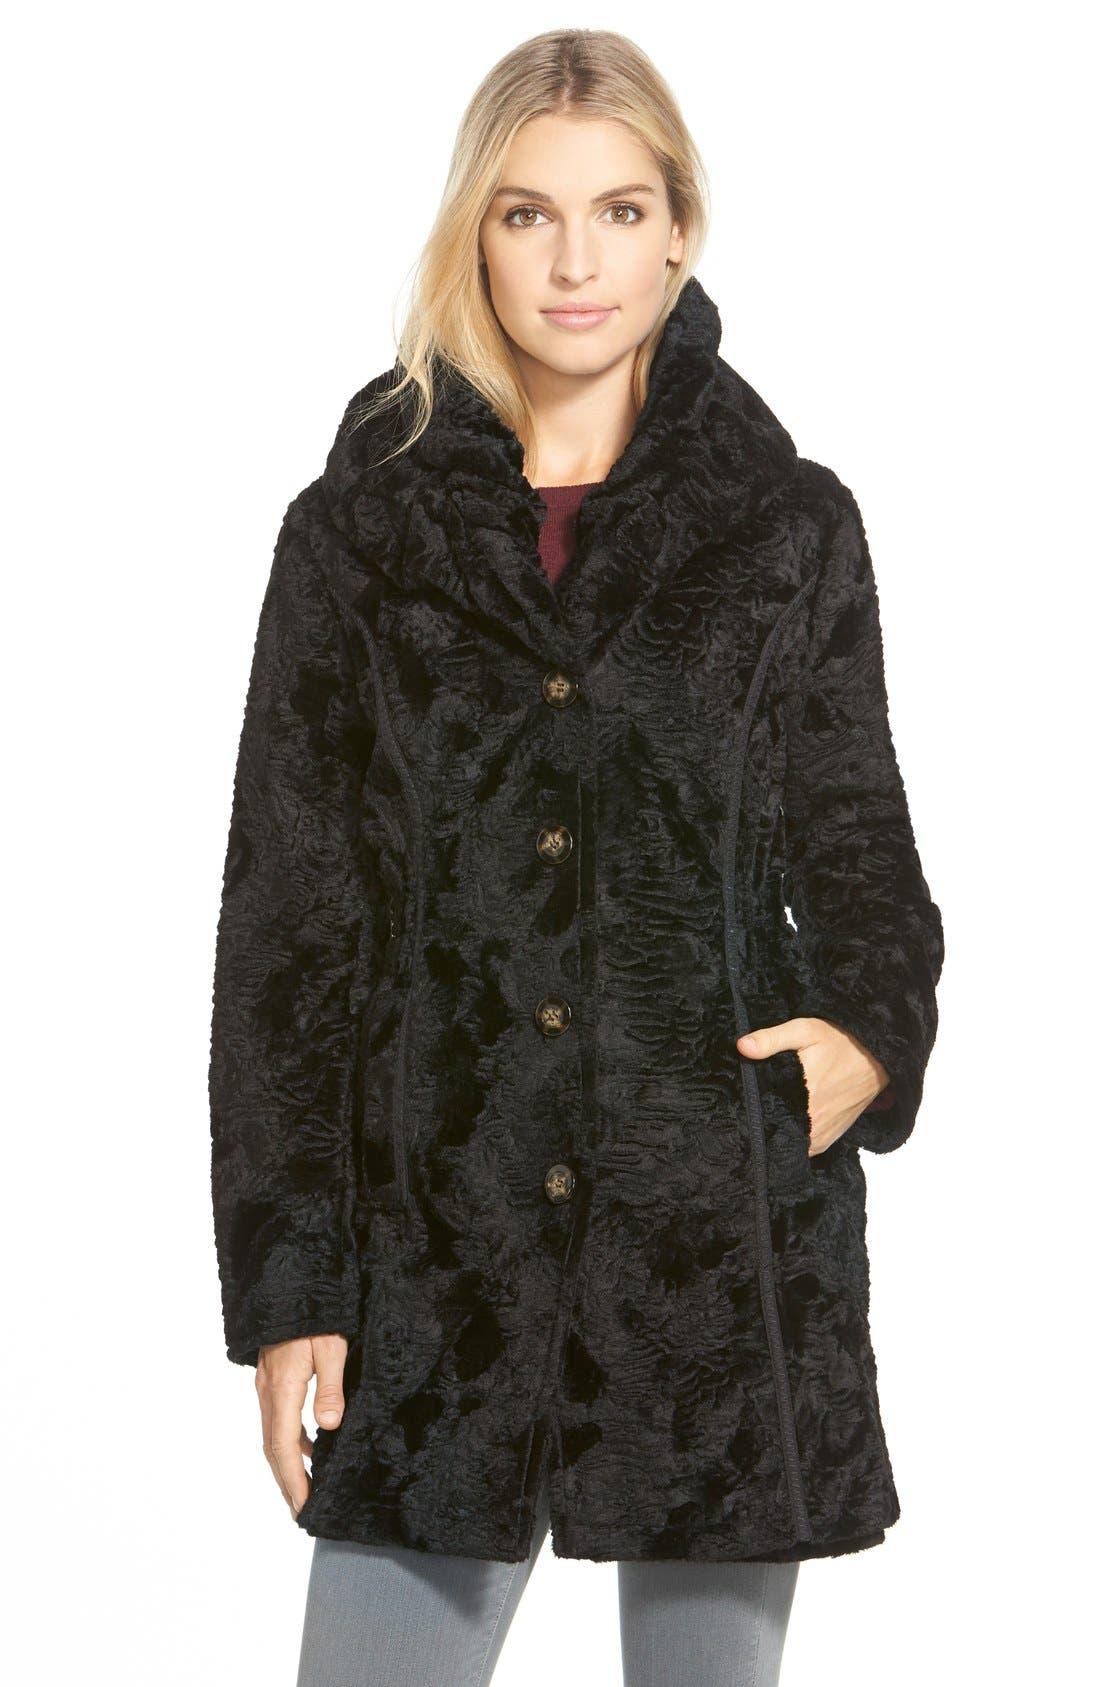 Laundry by ShelliSegalReversible FauxPersian Lamb Fur Coat,                         Main,                         color, Black